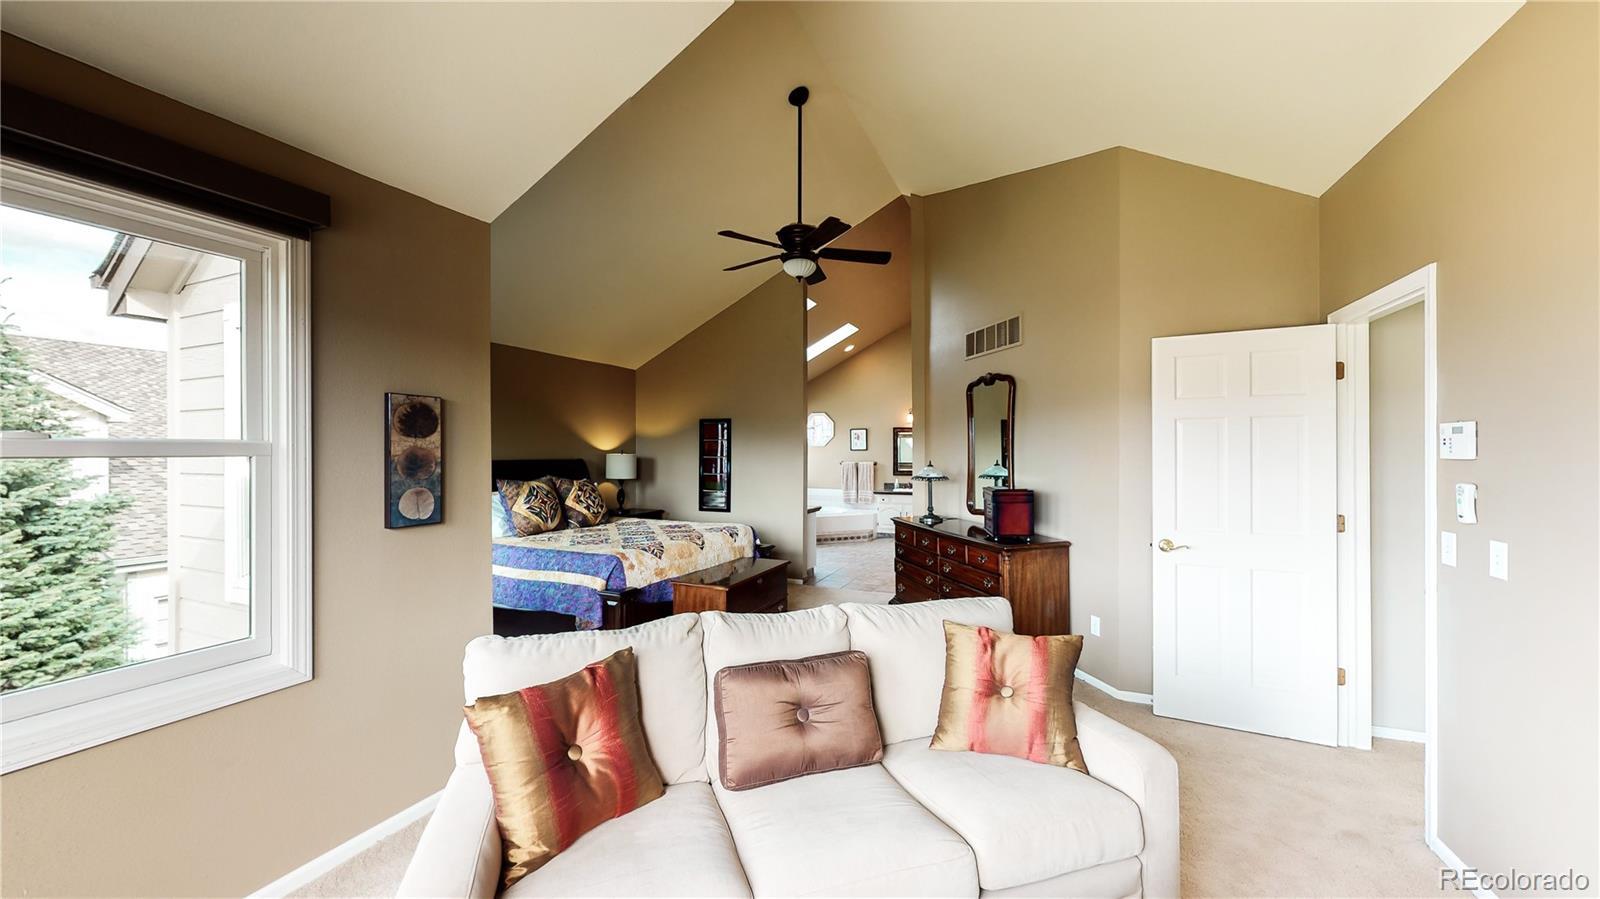 MLS# 9424893 - 21 - 2174 Terrace Drive, Highlands Ranch, CO 80126